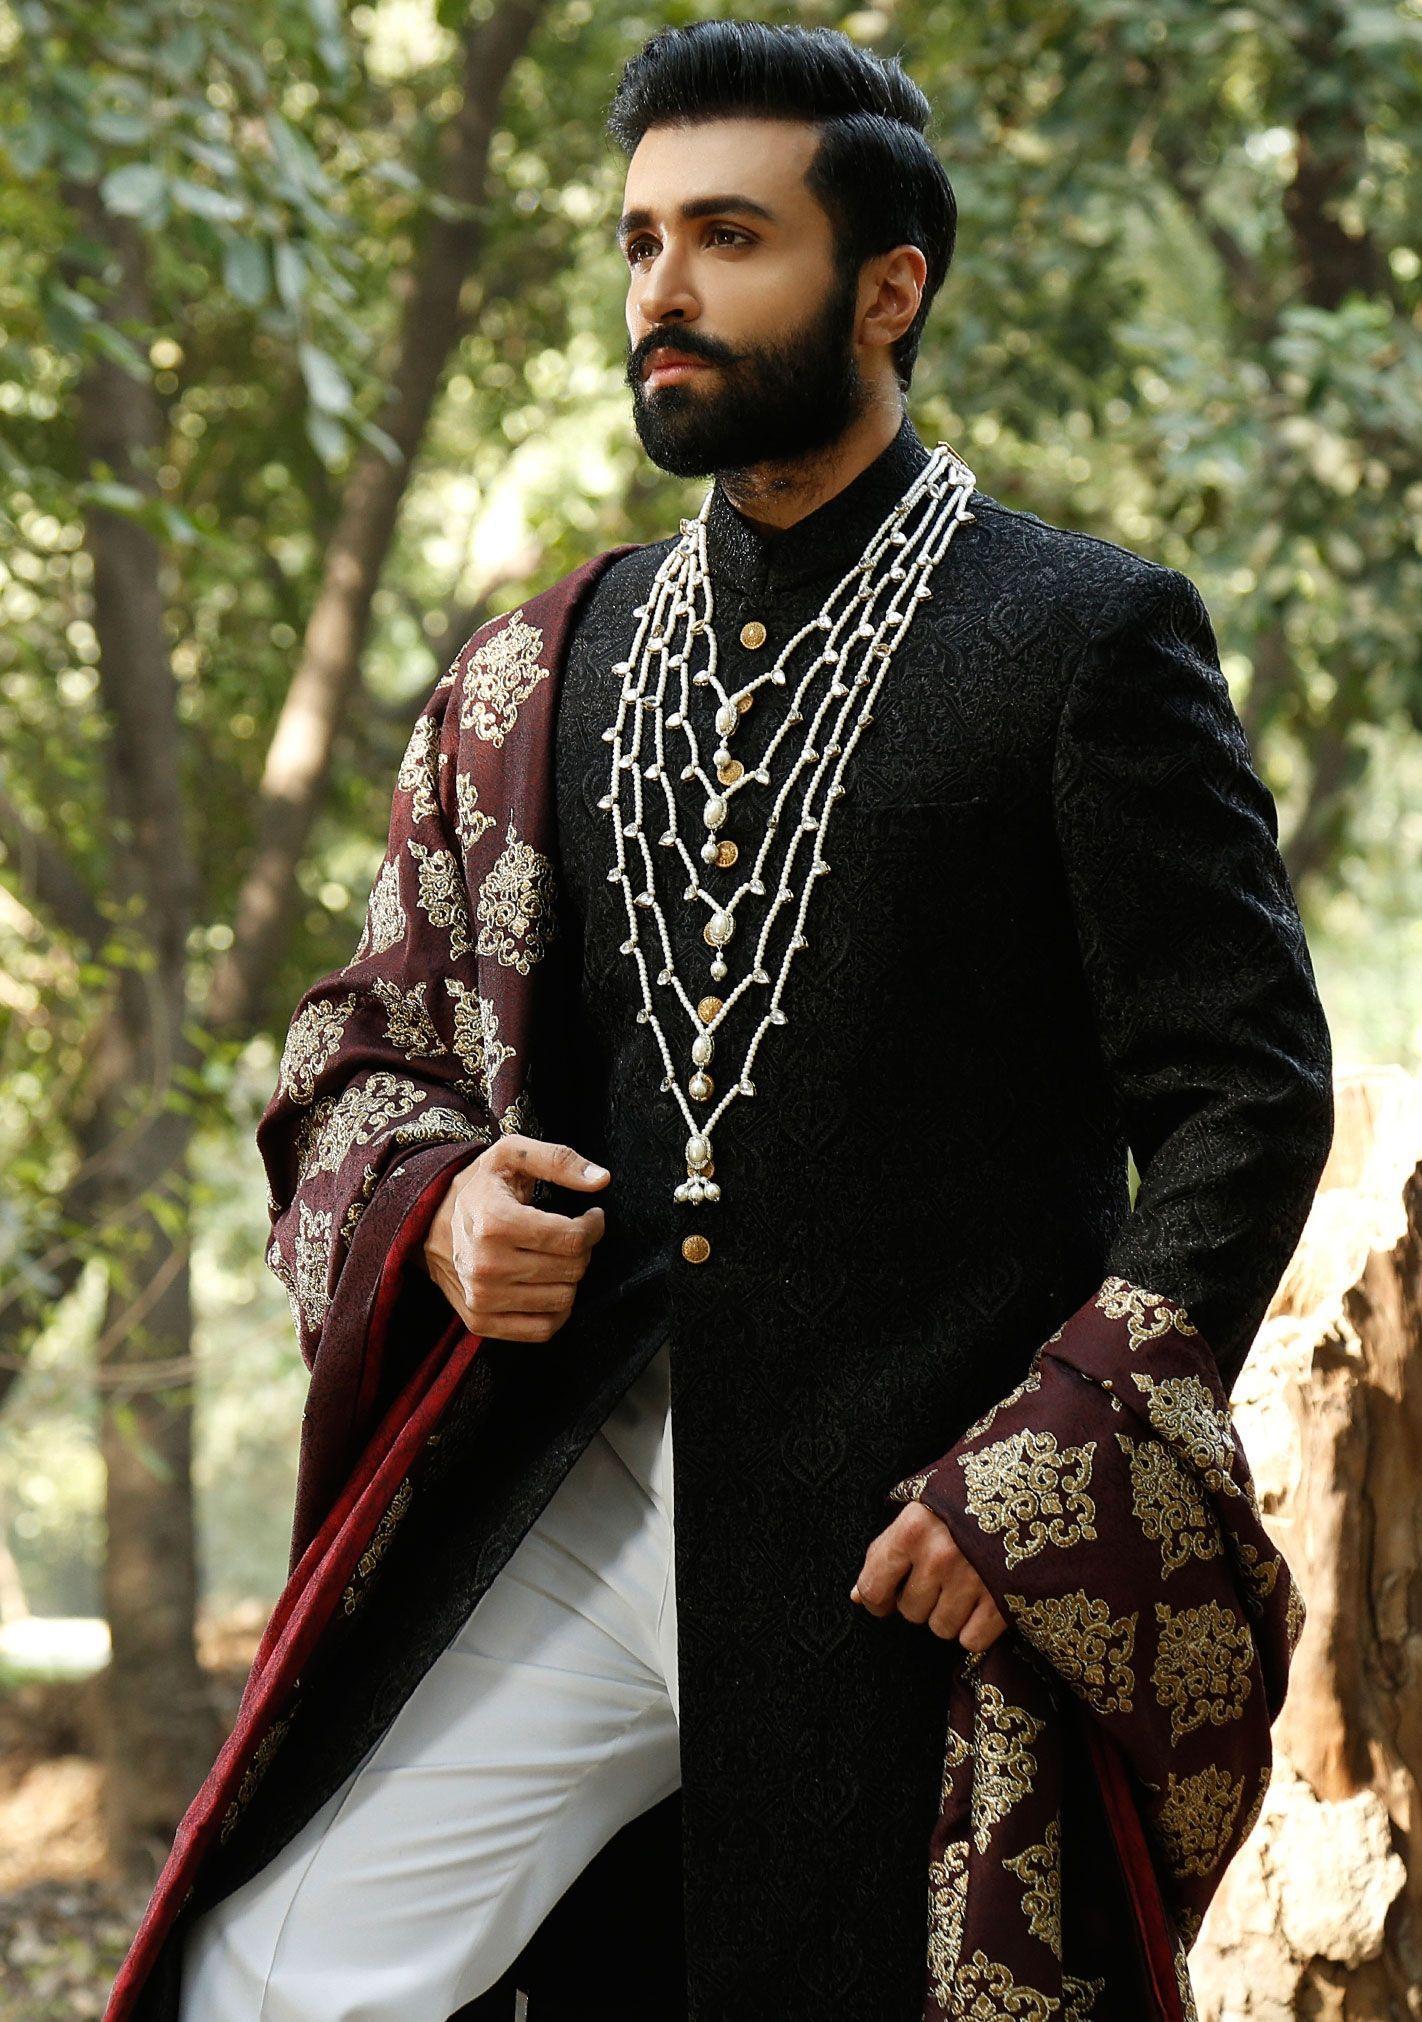 Famous Fashion Designers In India 2018: A famous fashion designer of Pakistan Amir Adnan presenting wedding rh:pinterest.com,Design